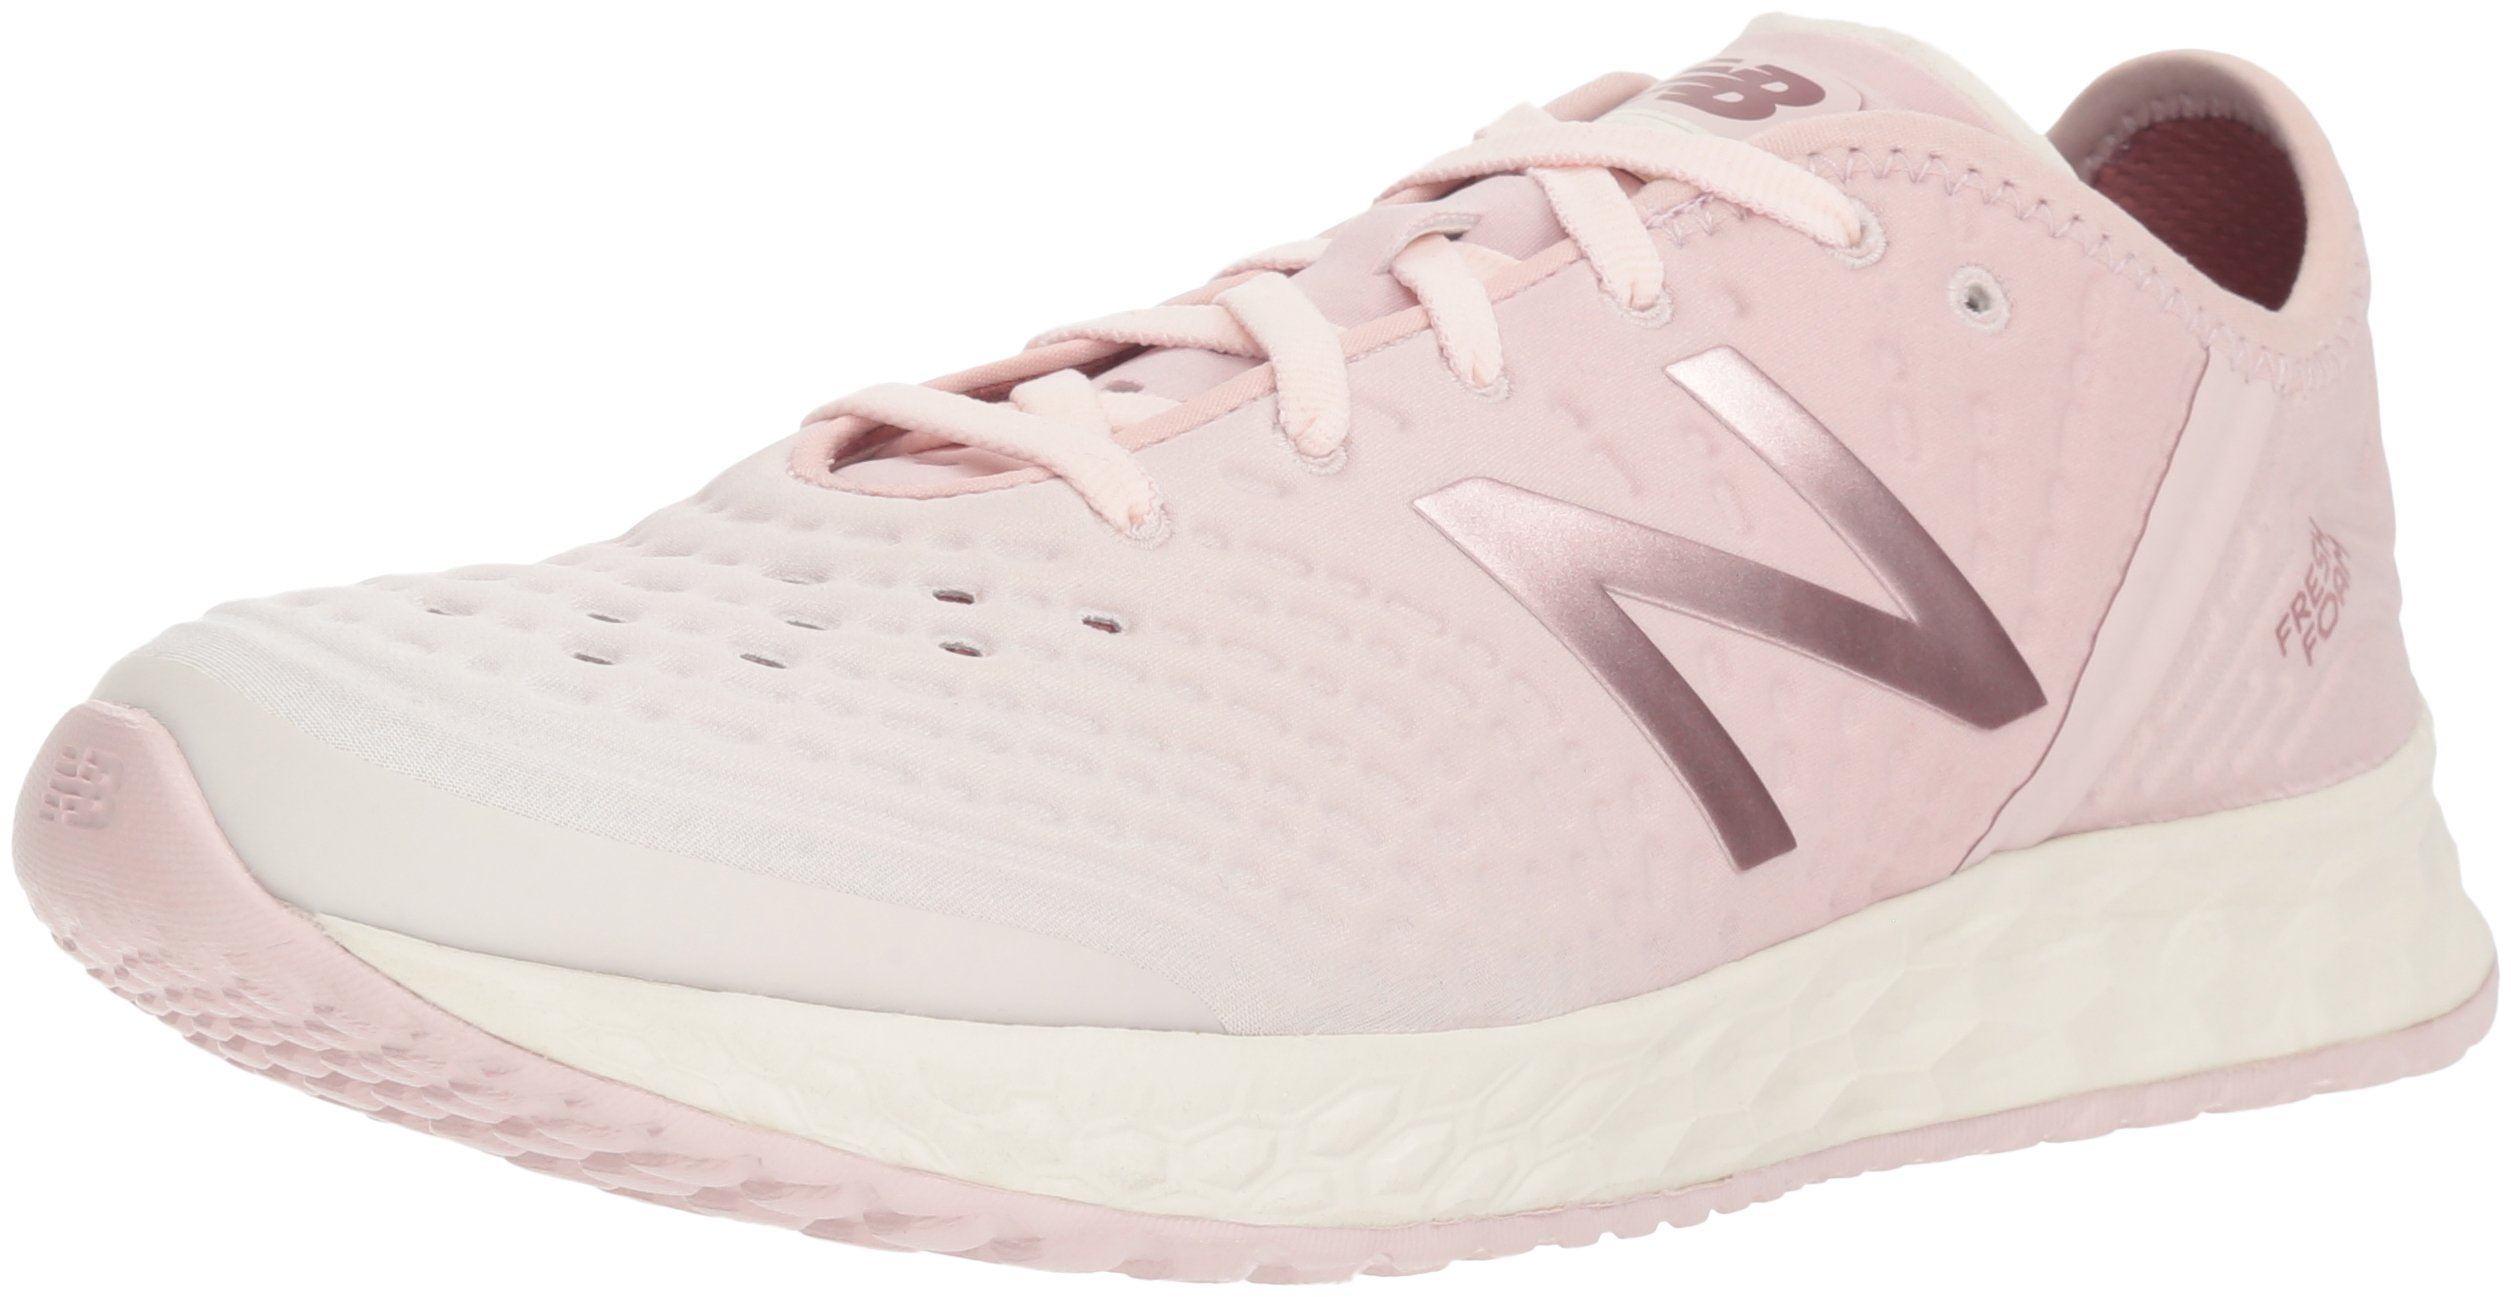 New Balance Women's Fresh Foam Crush v1 Cross Trainer, Light Pink, 8 B US